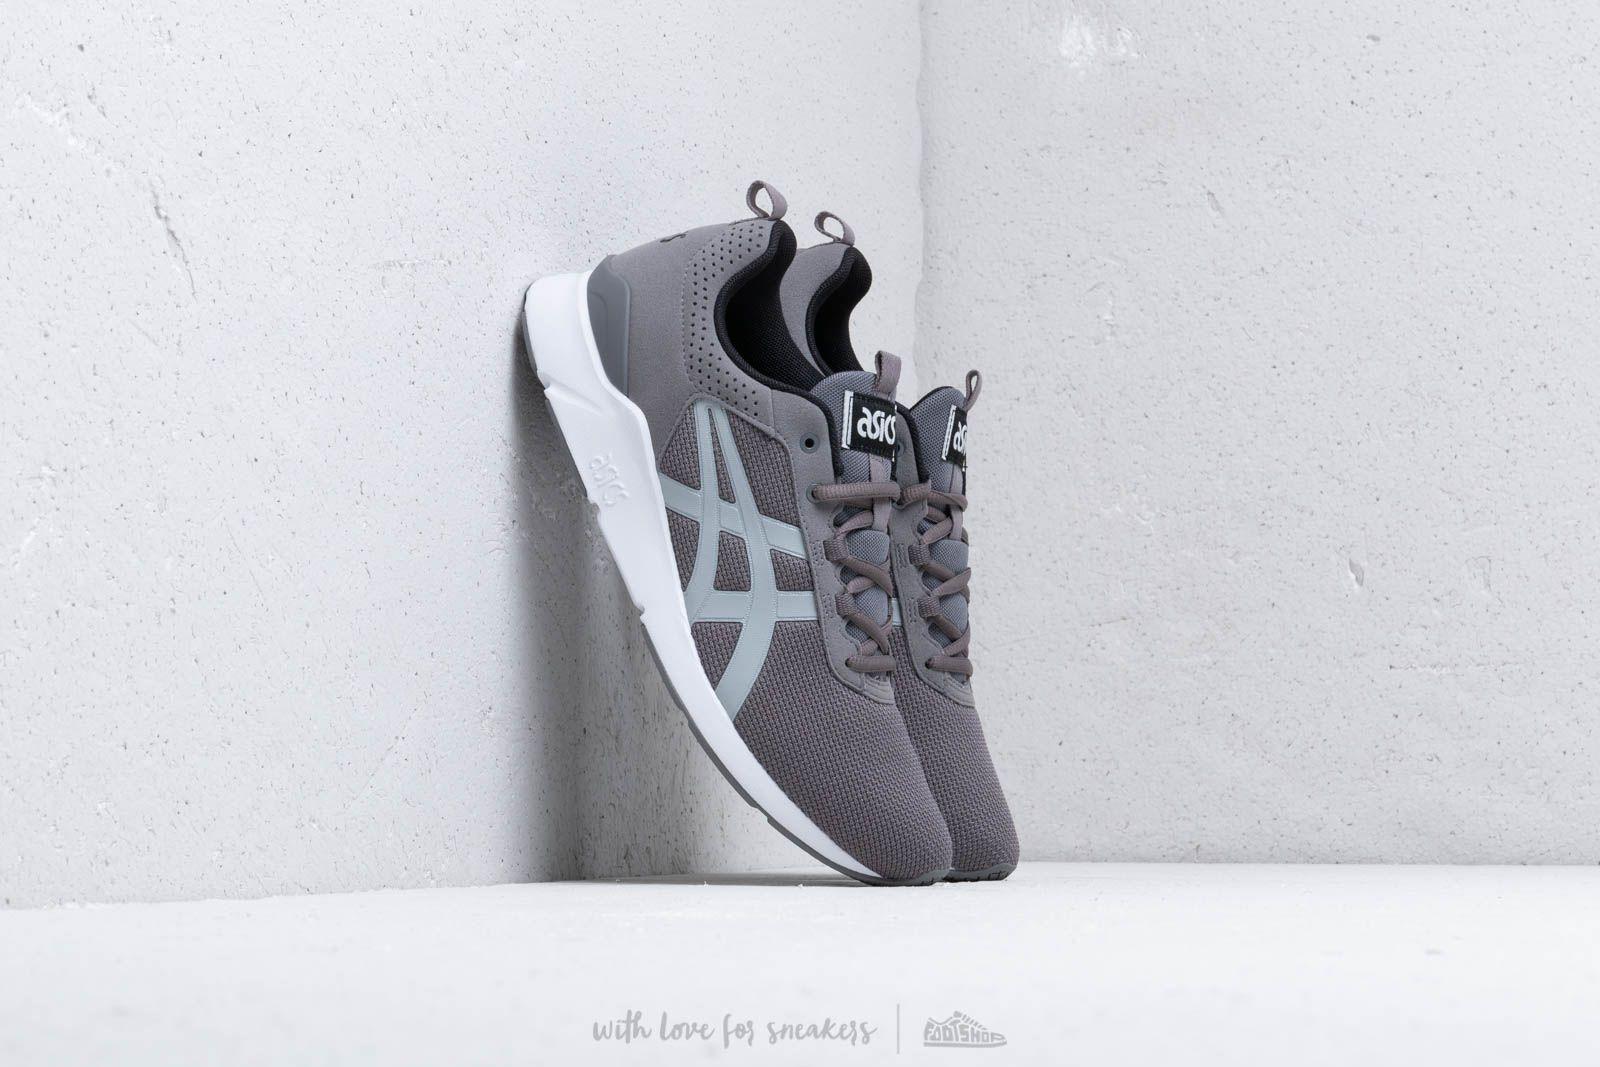 Asics Gel-Lyte Runner Carbon/ Mid Grey za skvelú cenu 76 € kúpite na Footshop.sk